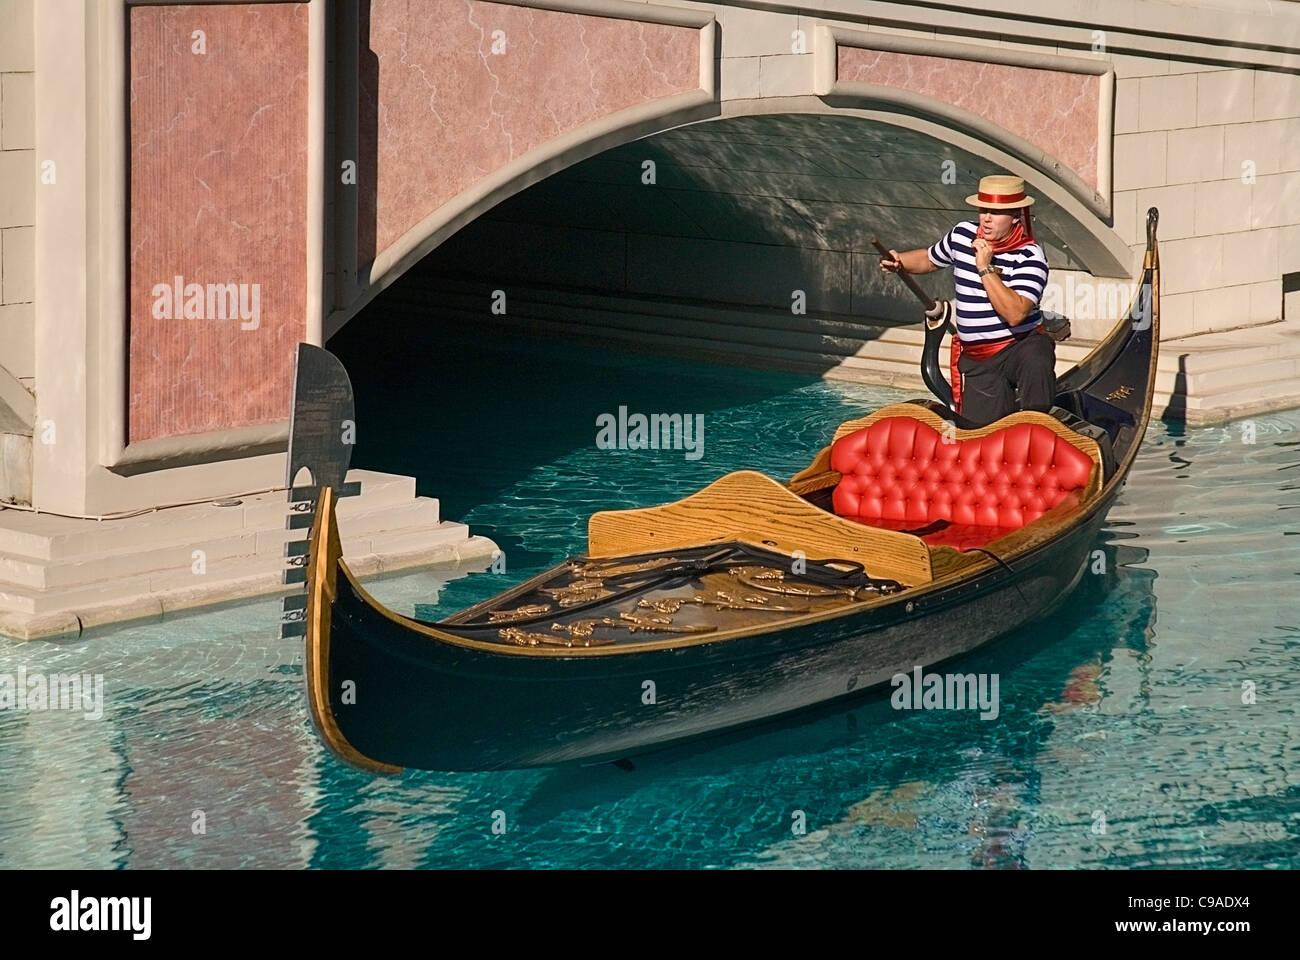 USA, Nevada, Las Vegas, The Strip, gondola outside side the entrance to the Venetian hotel and casino. - Stock Image